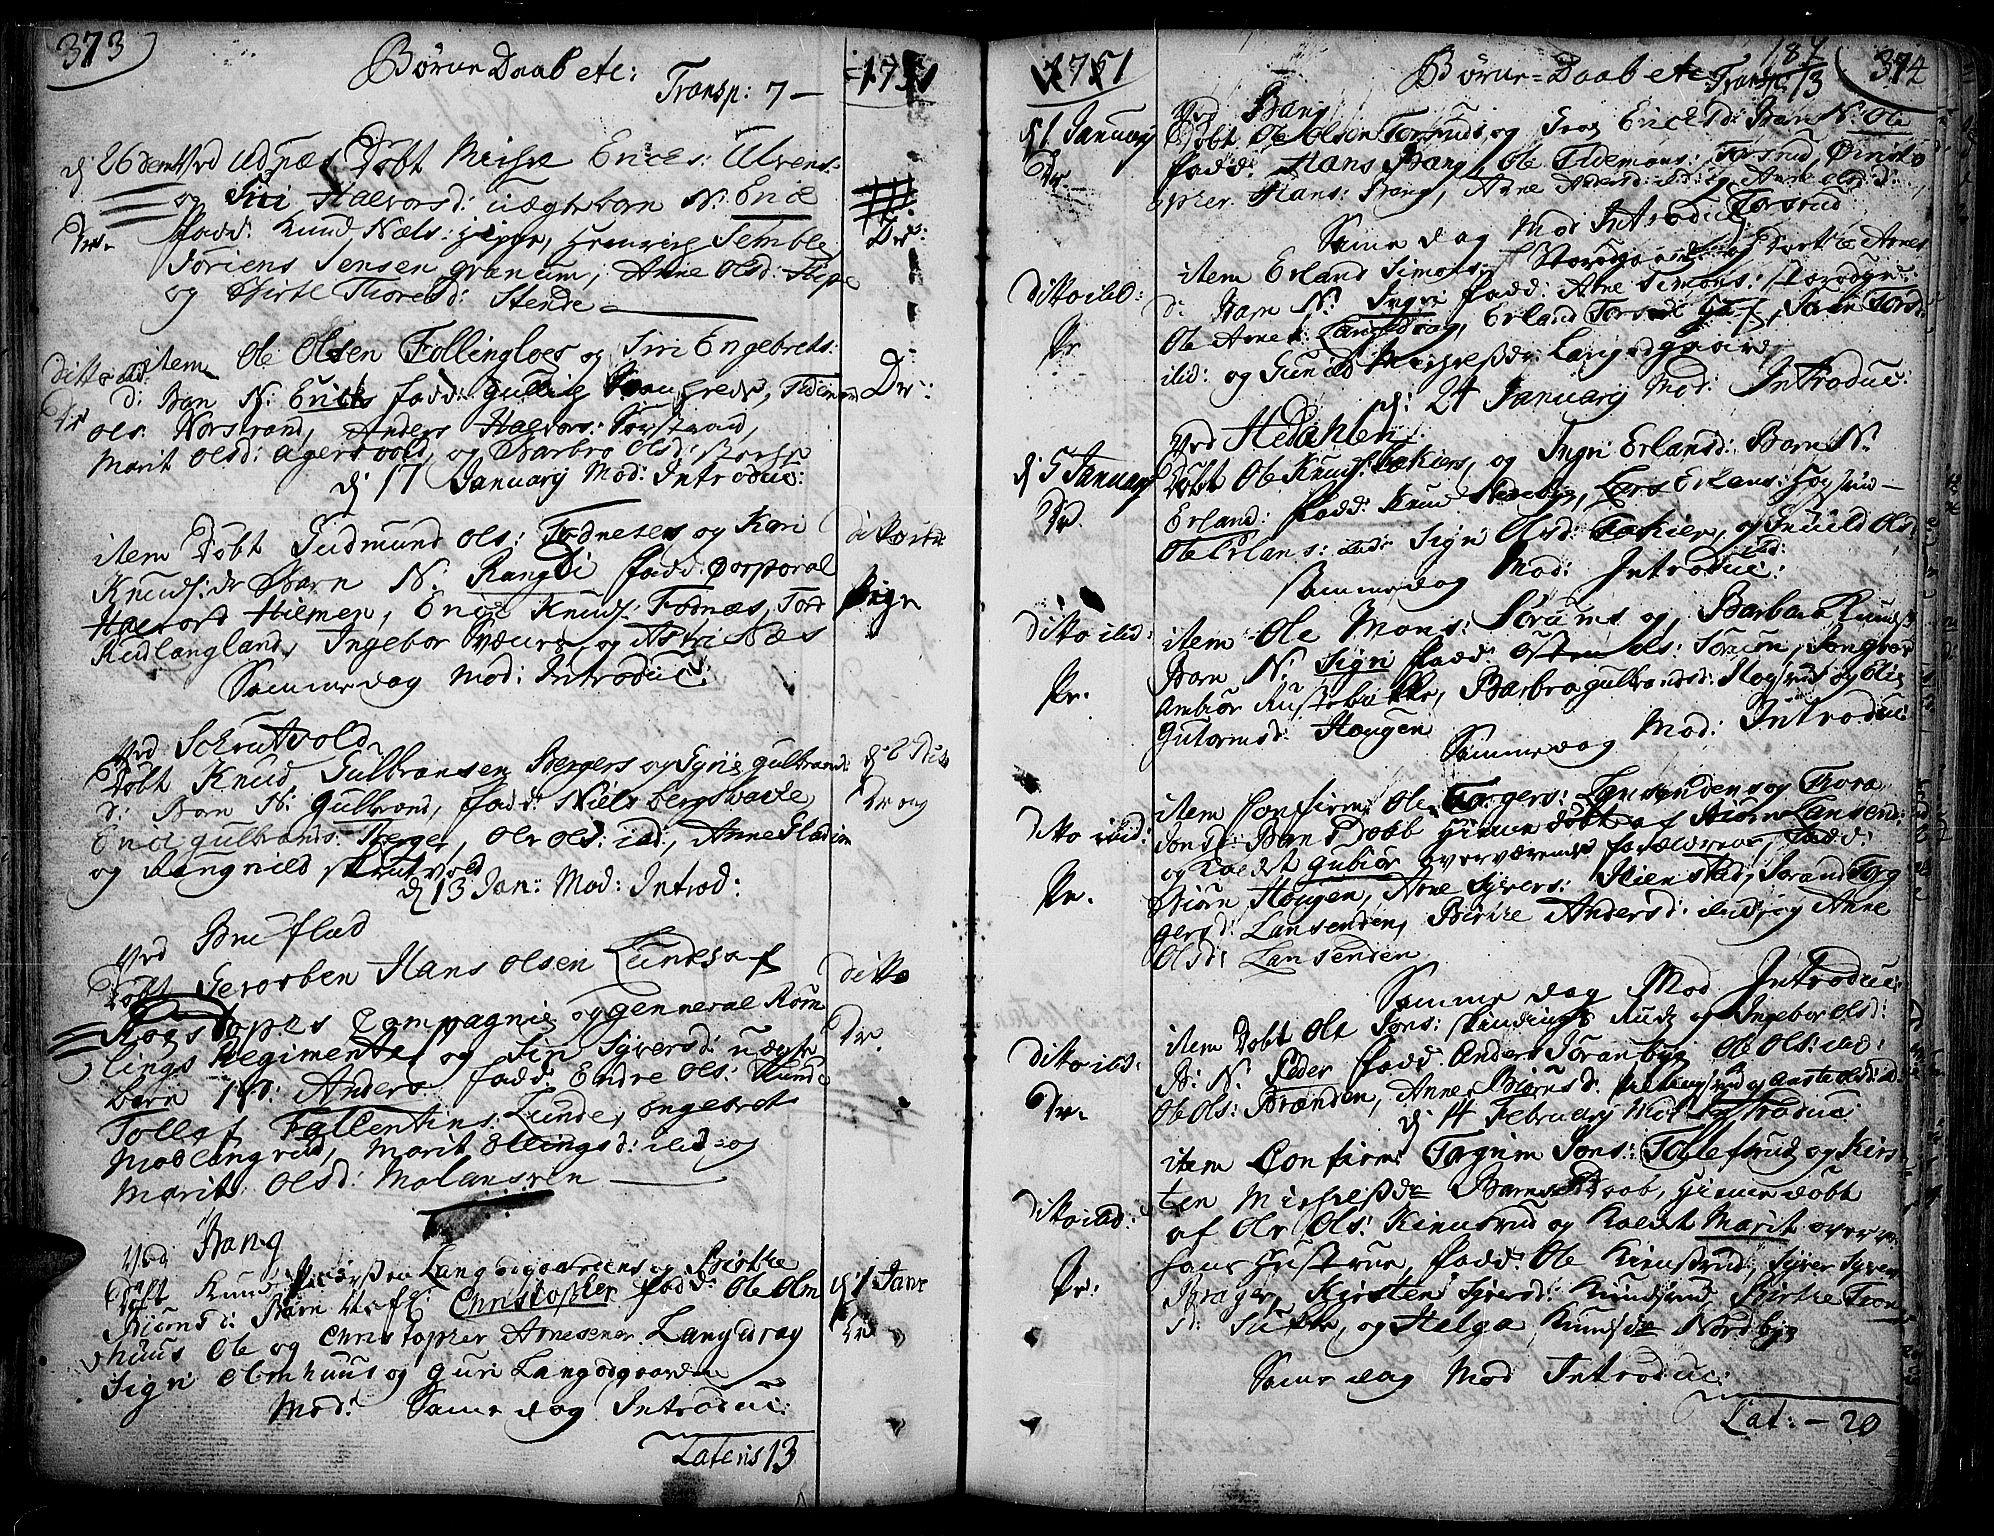 SAH, Aurdal prestekontor, Ministerialbok nr. 4, 1730-1762, s. 373-374